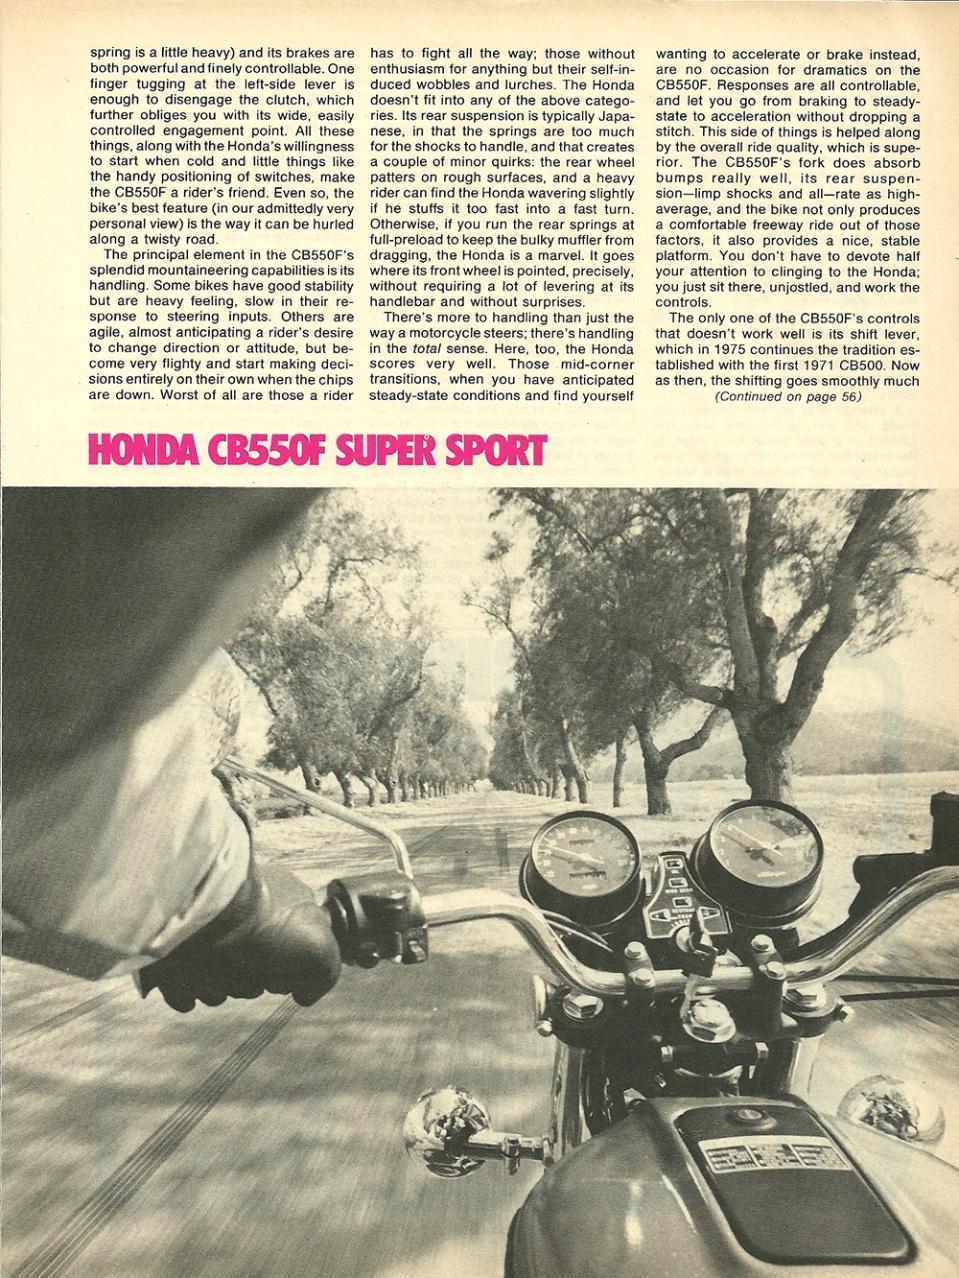 cycle-test-1975-honda-cb550f-super-sport-5